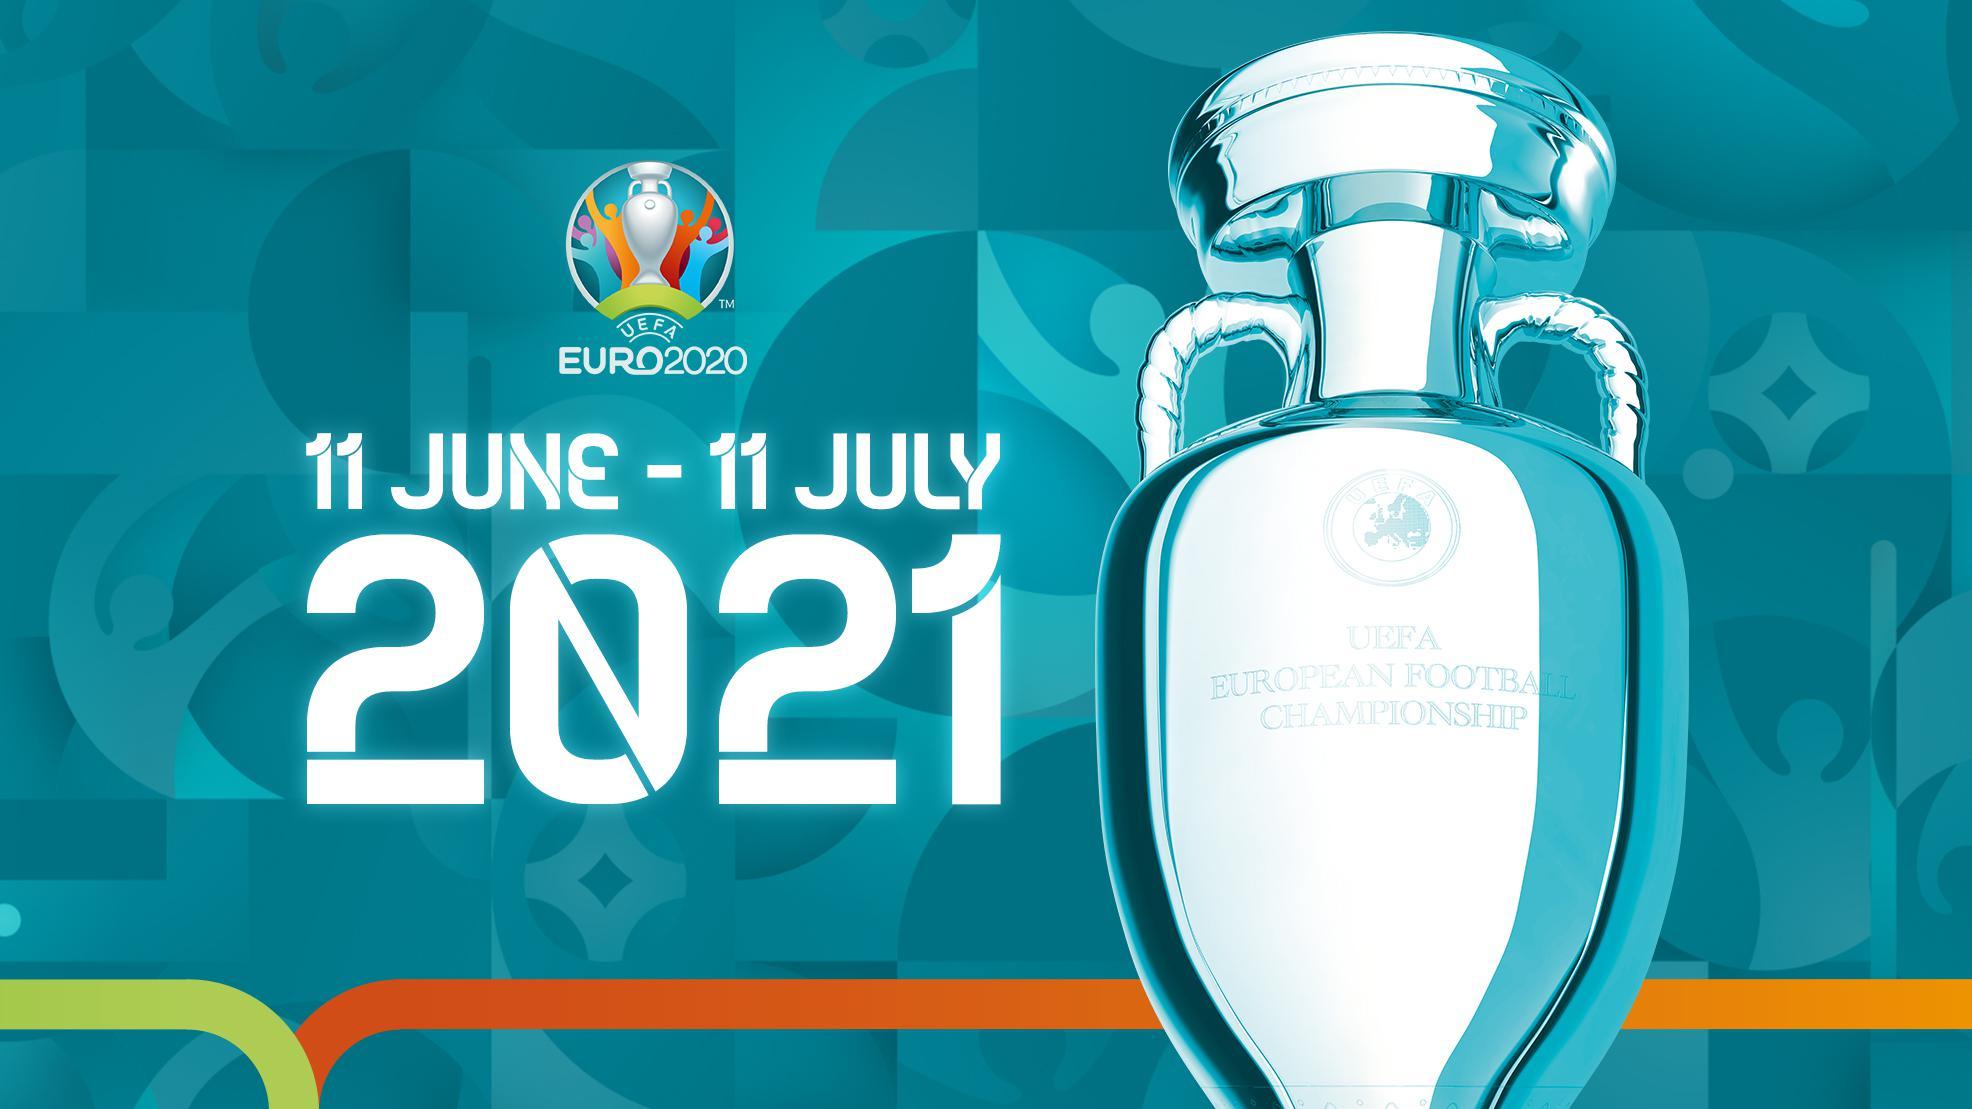 EURO 2020 TV Schedule